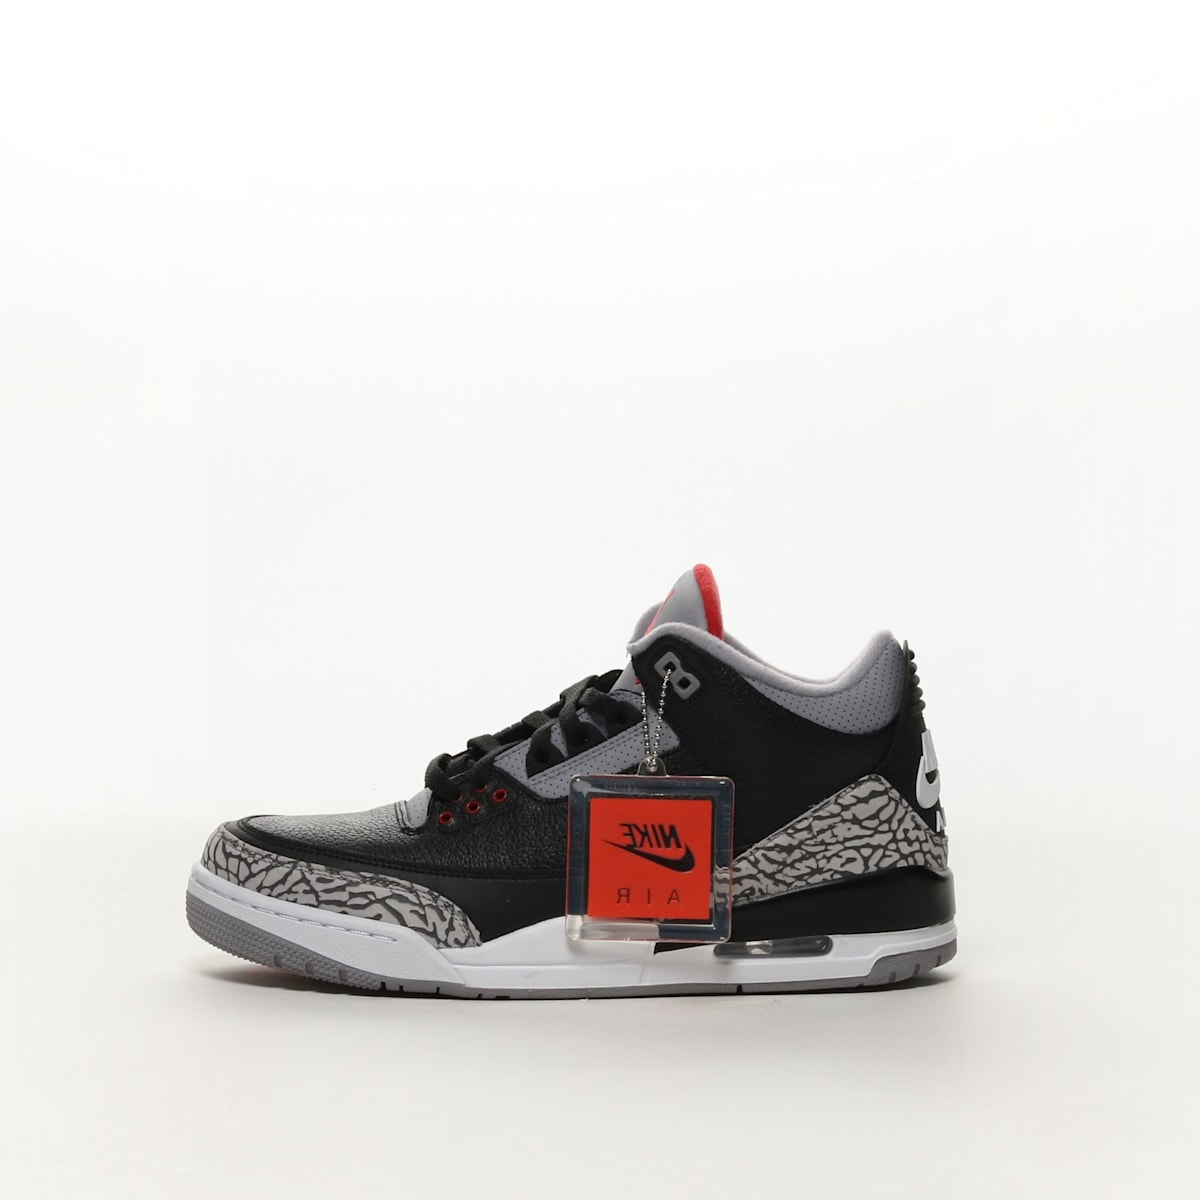 5c16a8413e1d71 Men s Air Jordan 3 Retro OG Shoe - BLACK FIRE RED-CEMENT GREY-WHITE ...